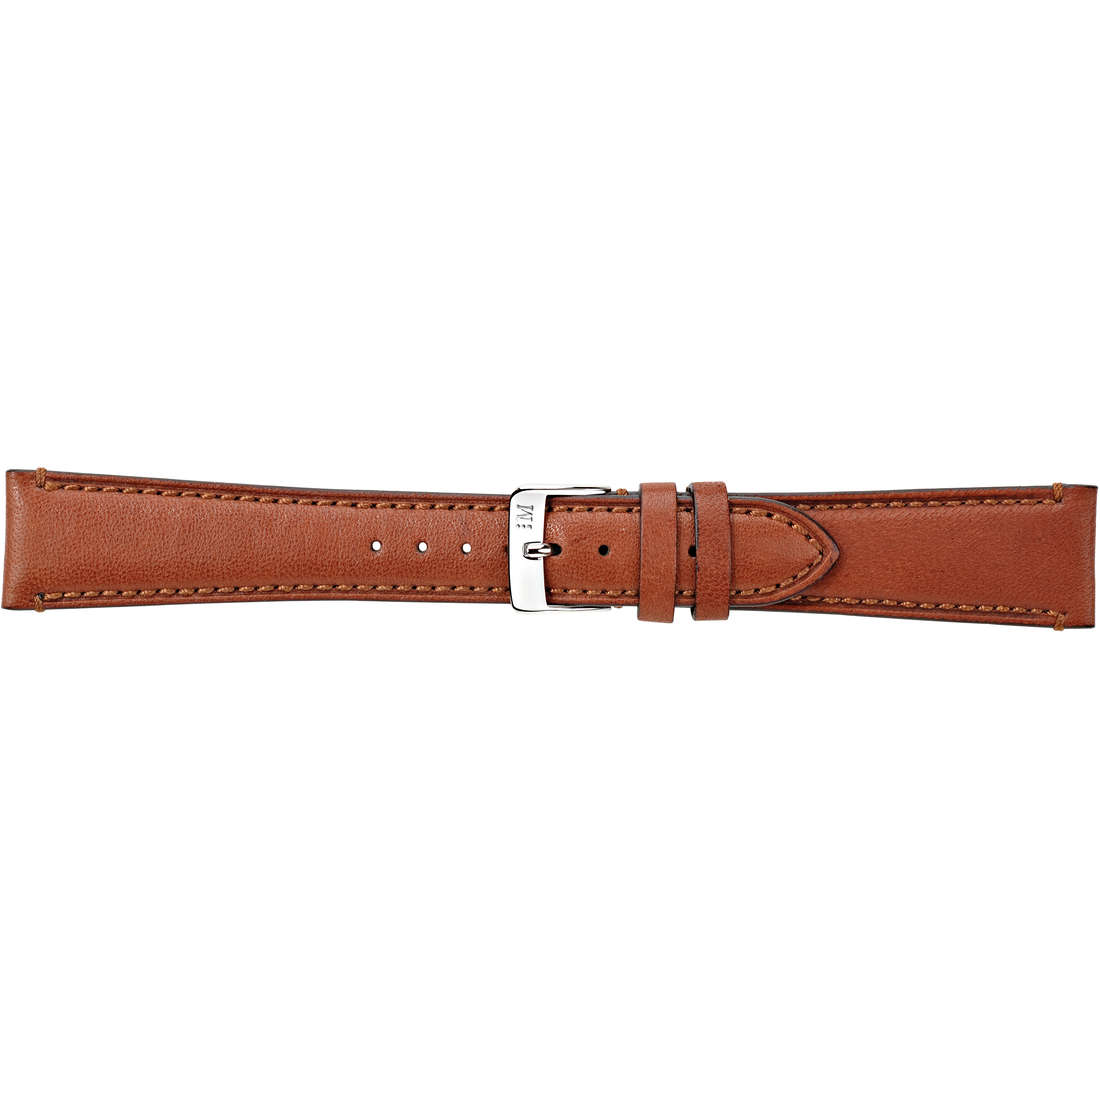 watch watch bands watch straps man Morellato Manufatti A01X3495006041CR16